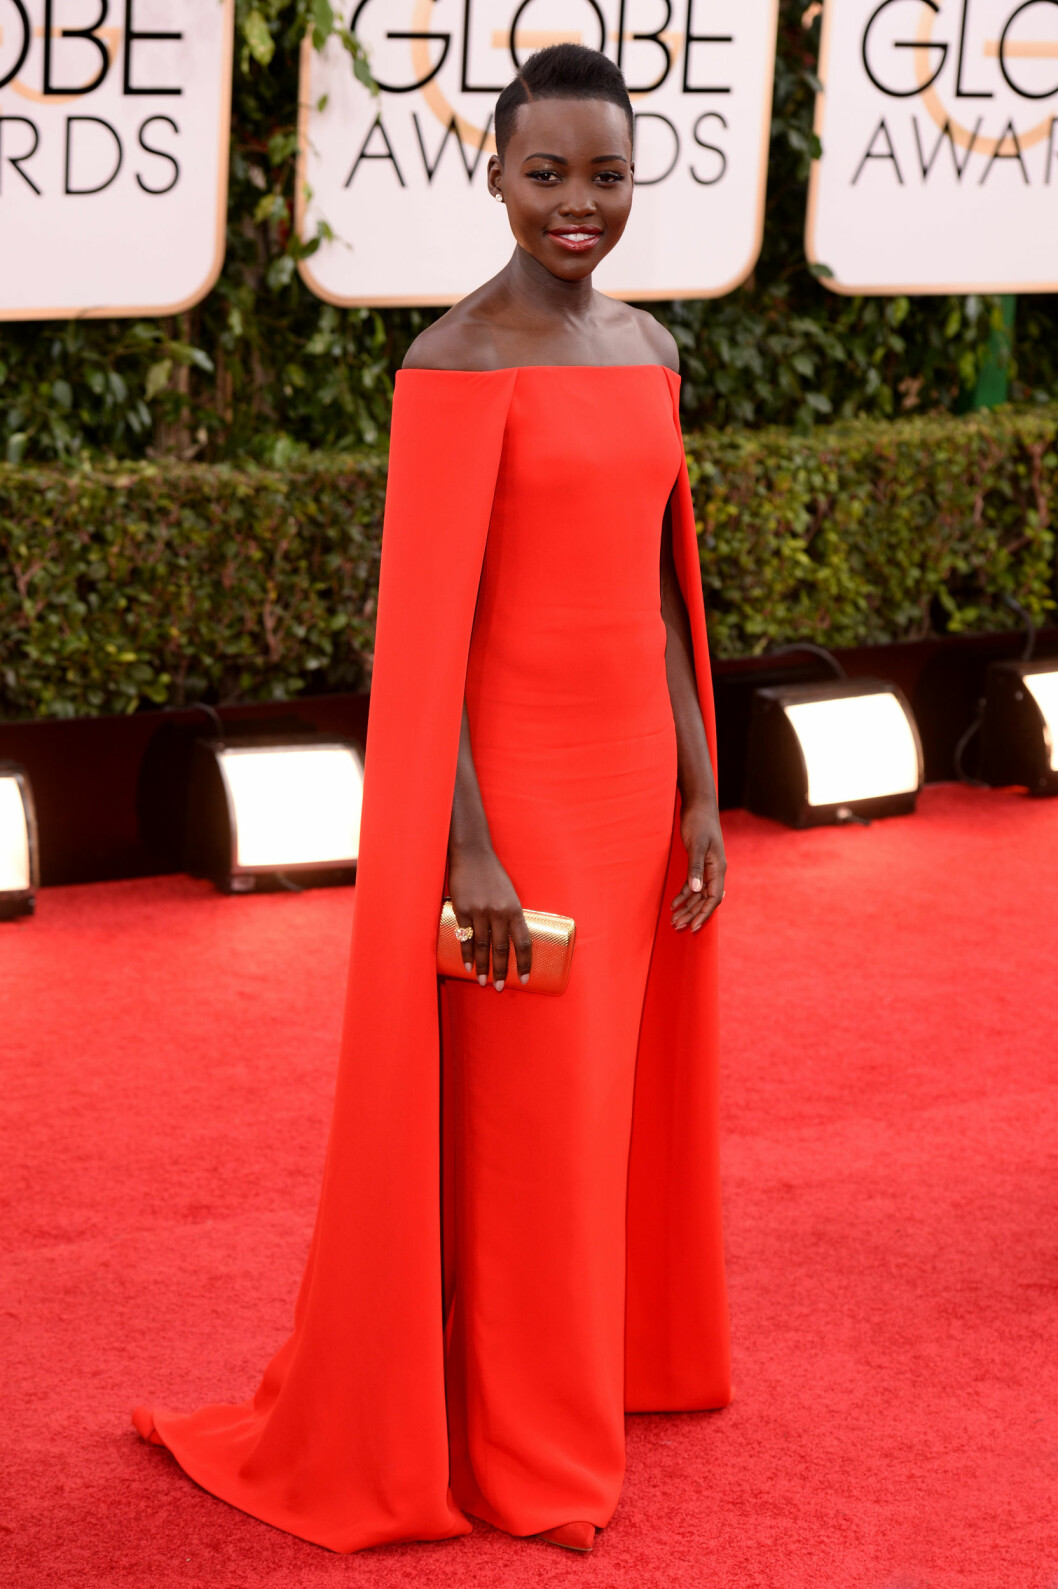 FLOTT: Nyong'o så fantastisk ut i denne nydelige Ralph Lauren-kjolen på årets Golden Globes.  Foto: REX/David Fisher/All Over Press